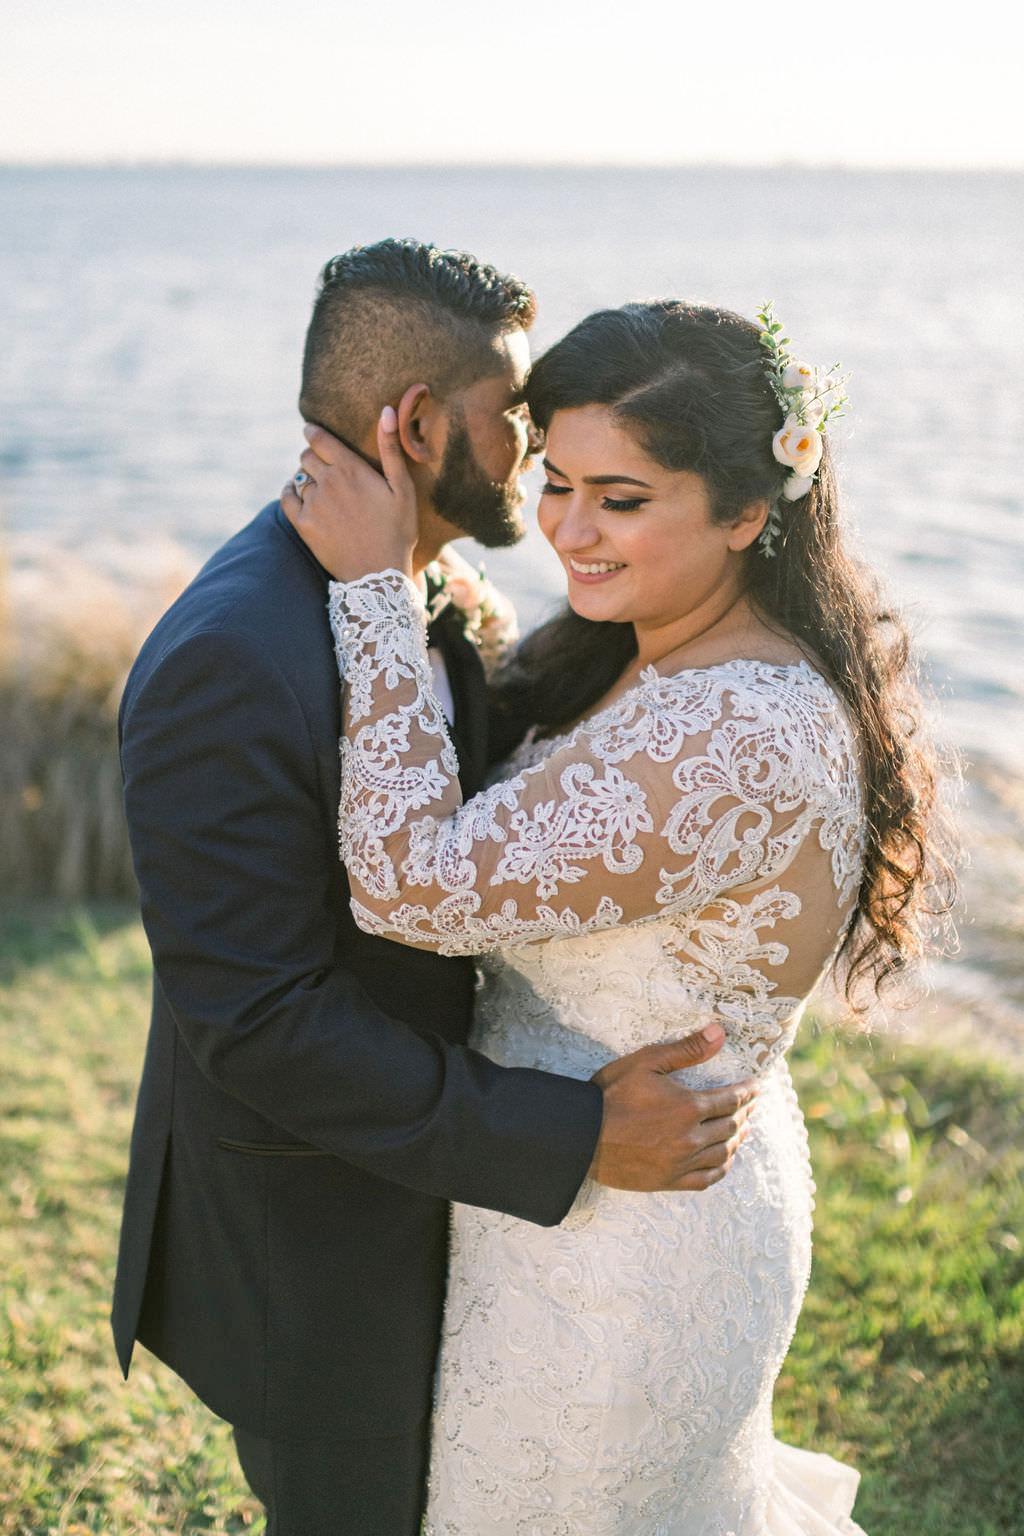 Indian Sarasota Bride and Groom Waterfront Wedding Portrait